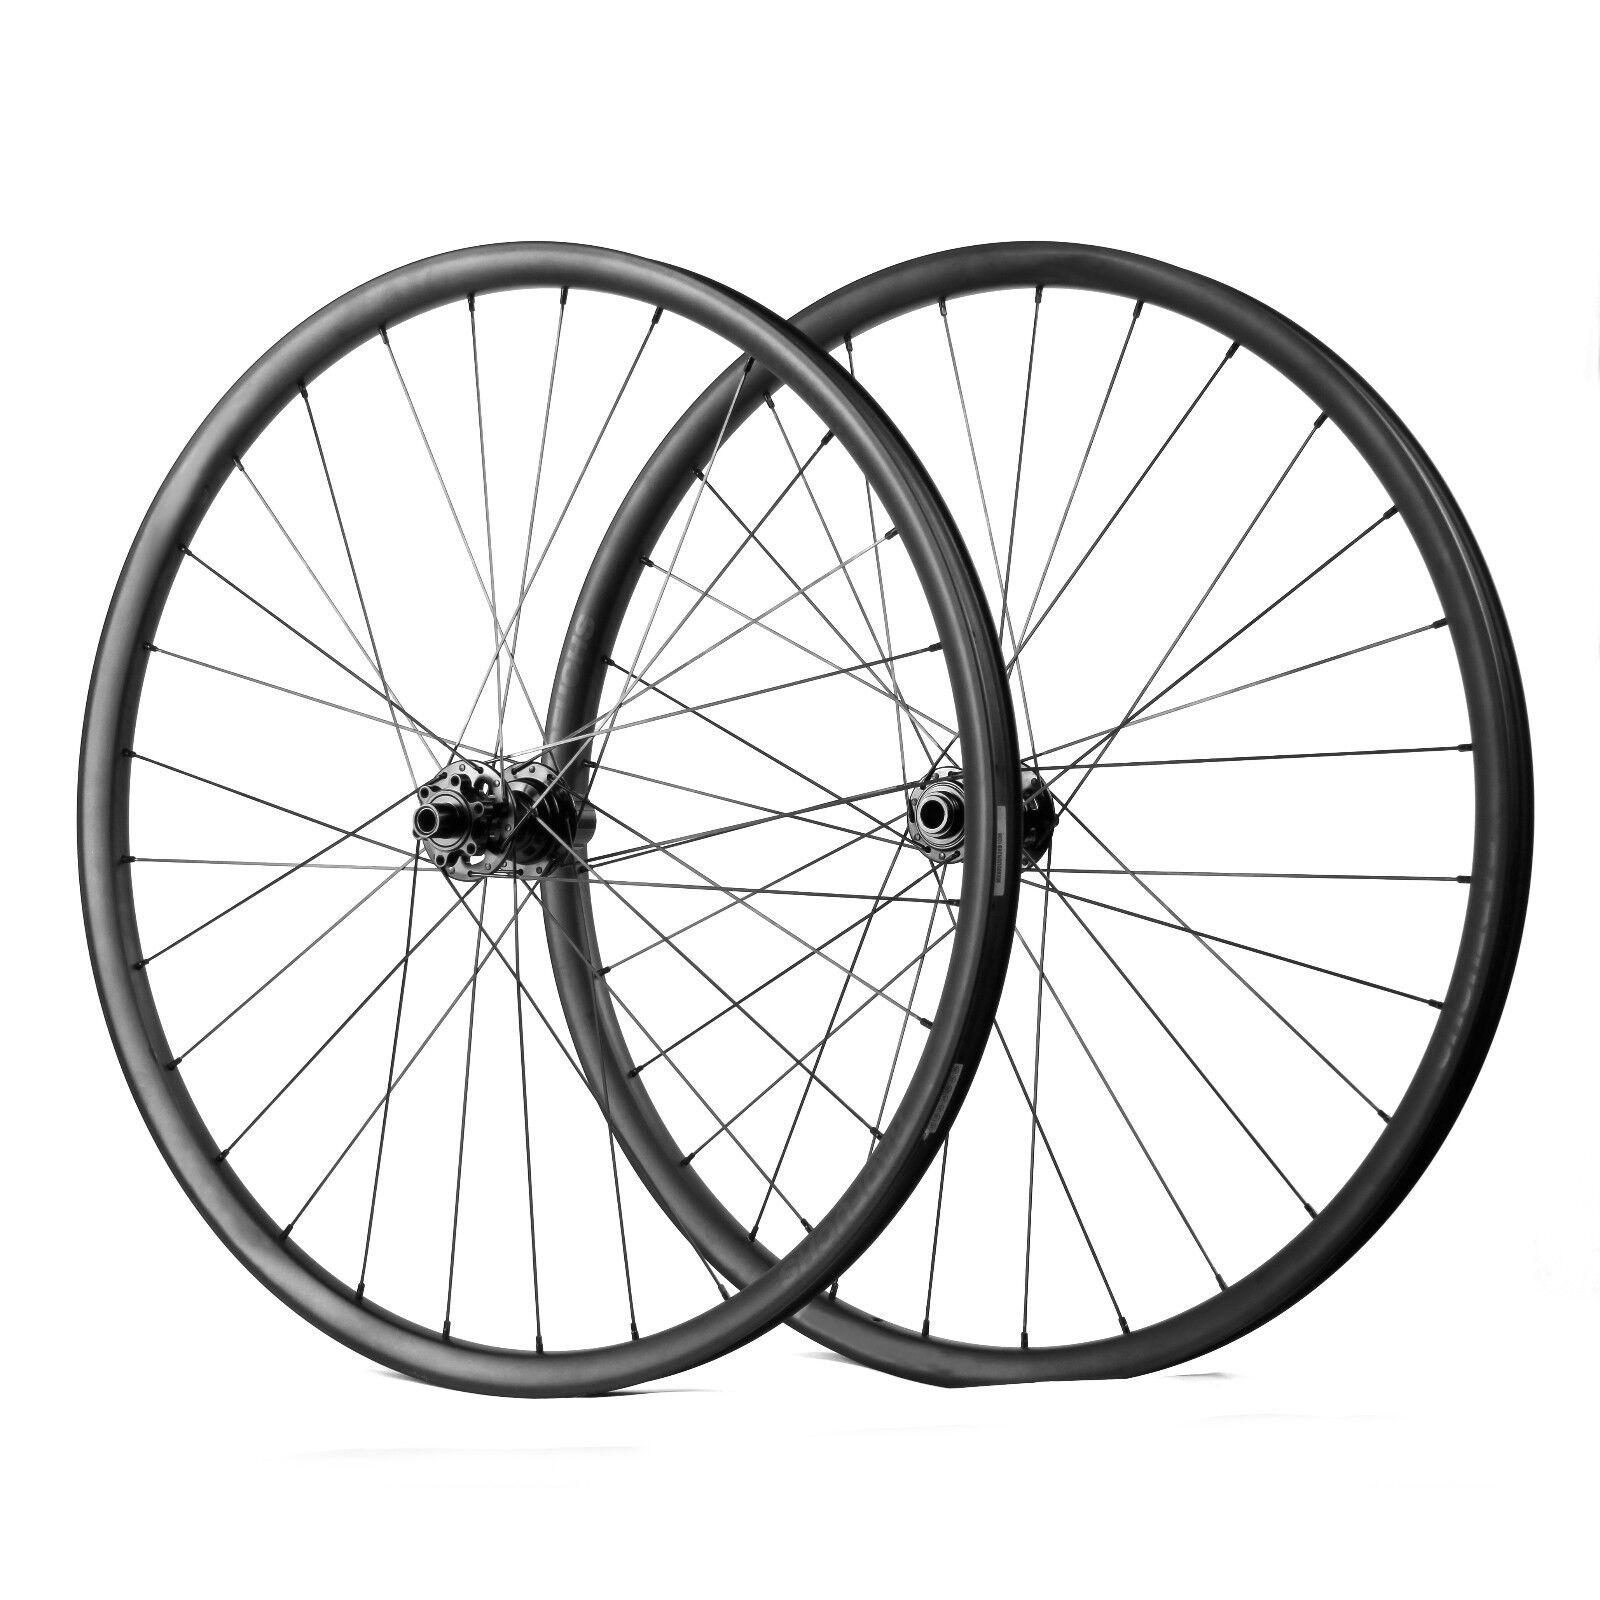 29er Carbon bike  wheel 50mm width MTB carbon wheels Front 15100, Rear 12142  very popular